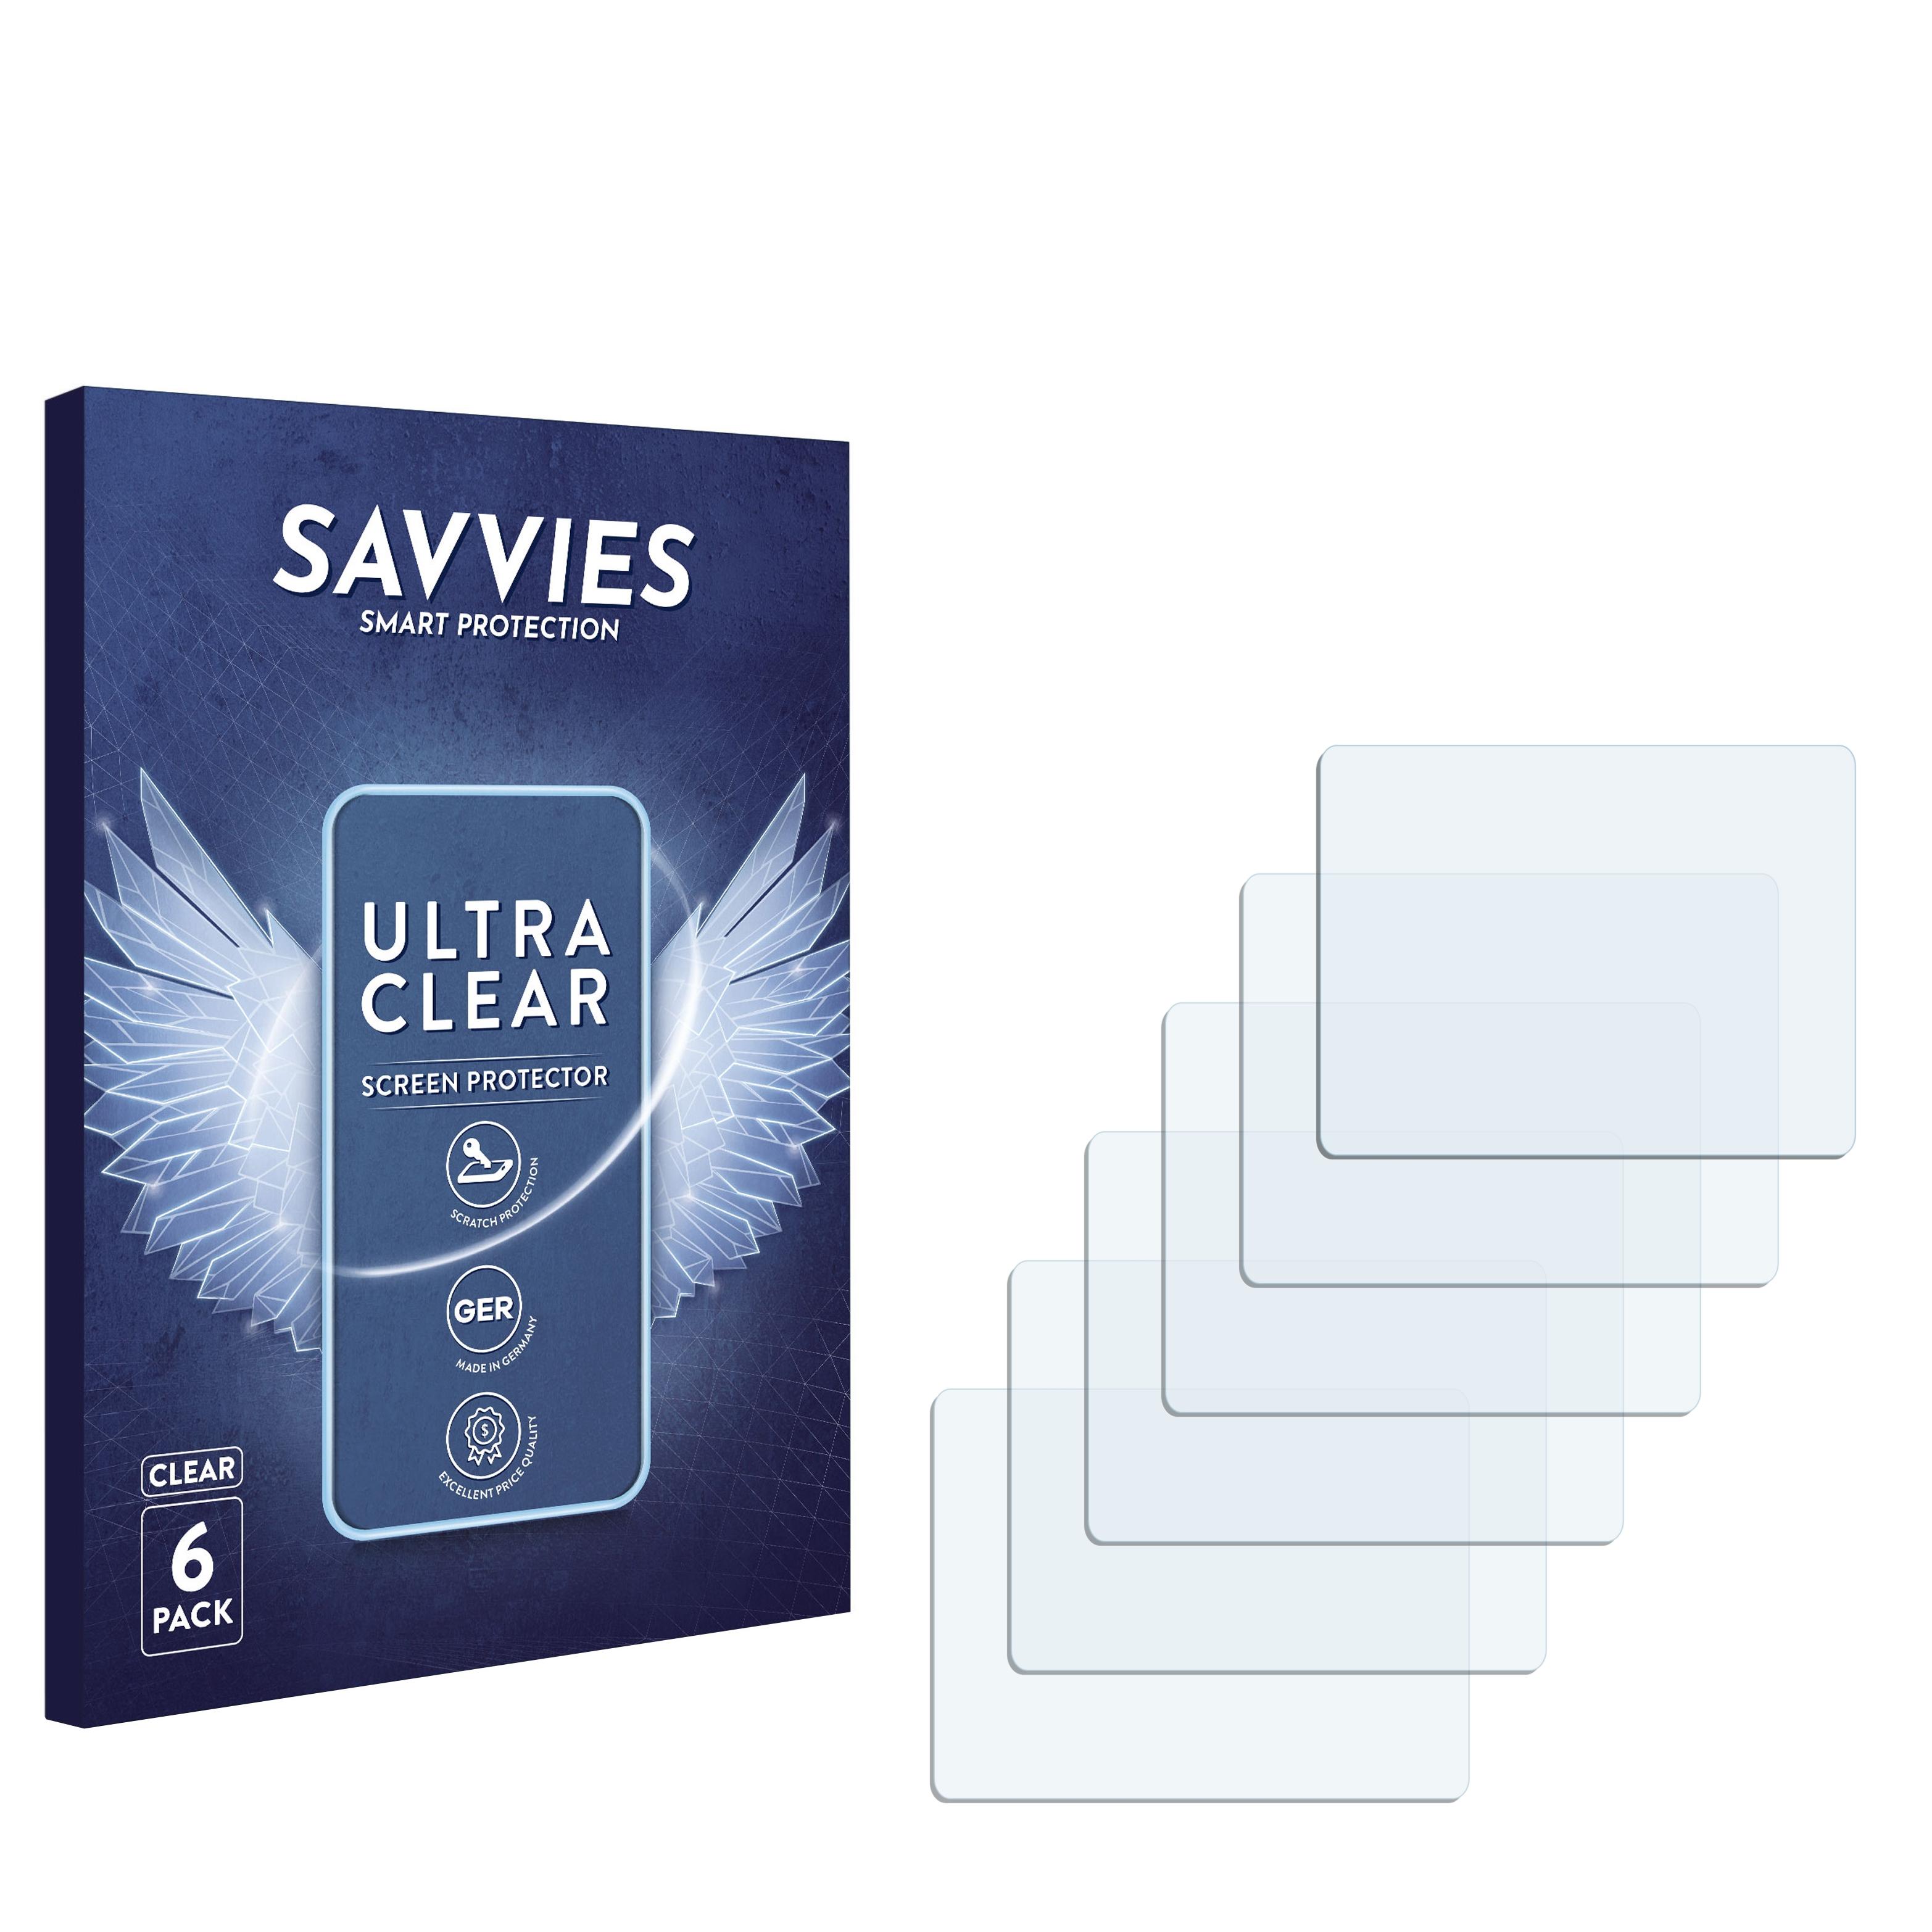 Ochranná fólie Savvies na HP Photosmart M22, 6ks